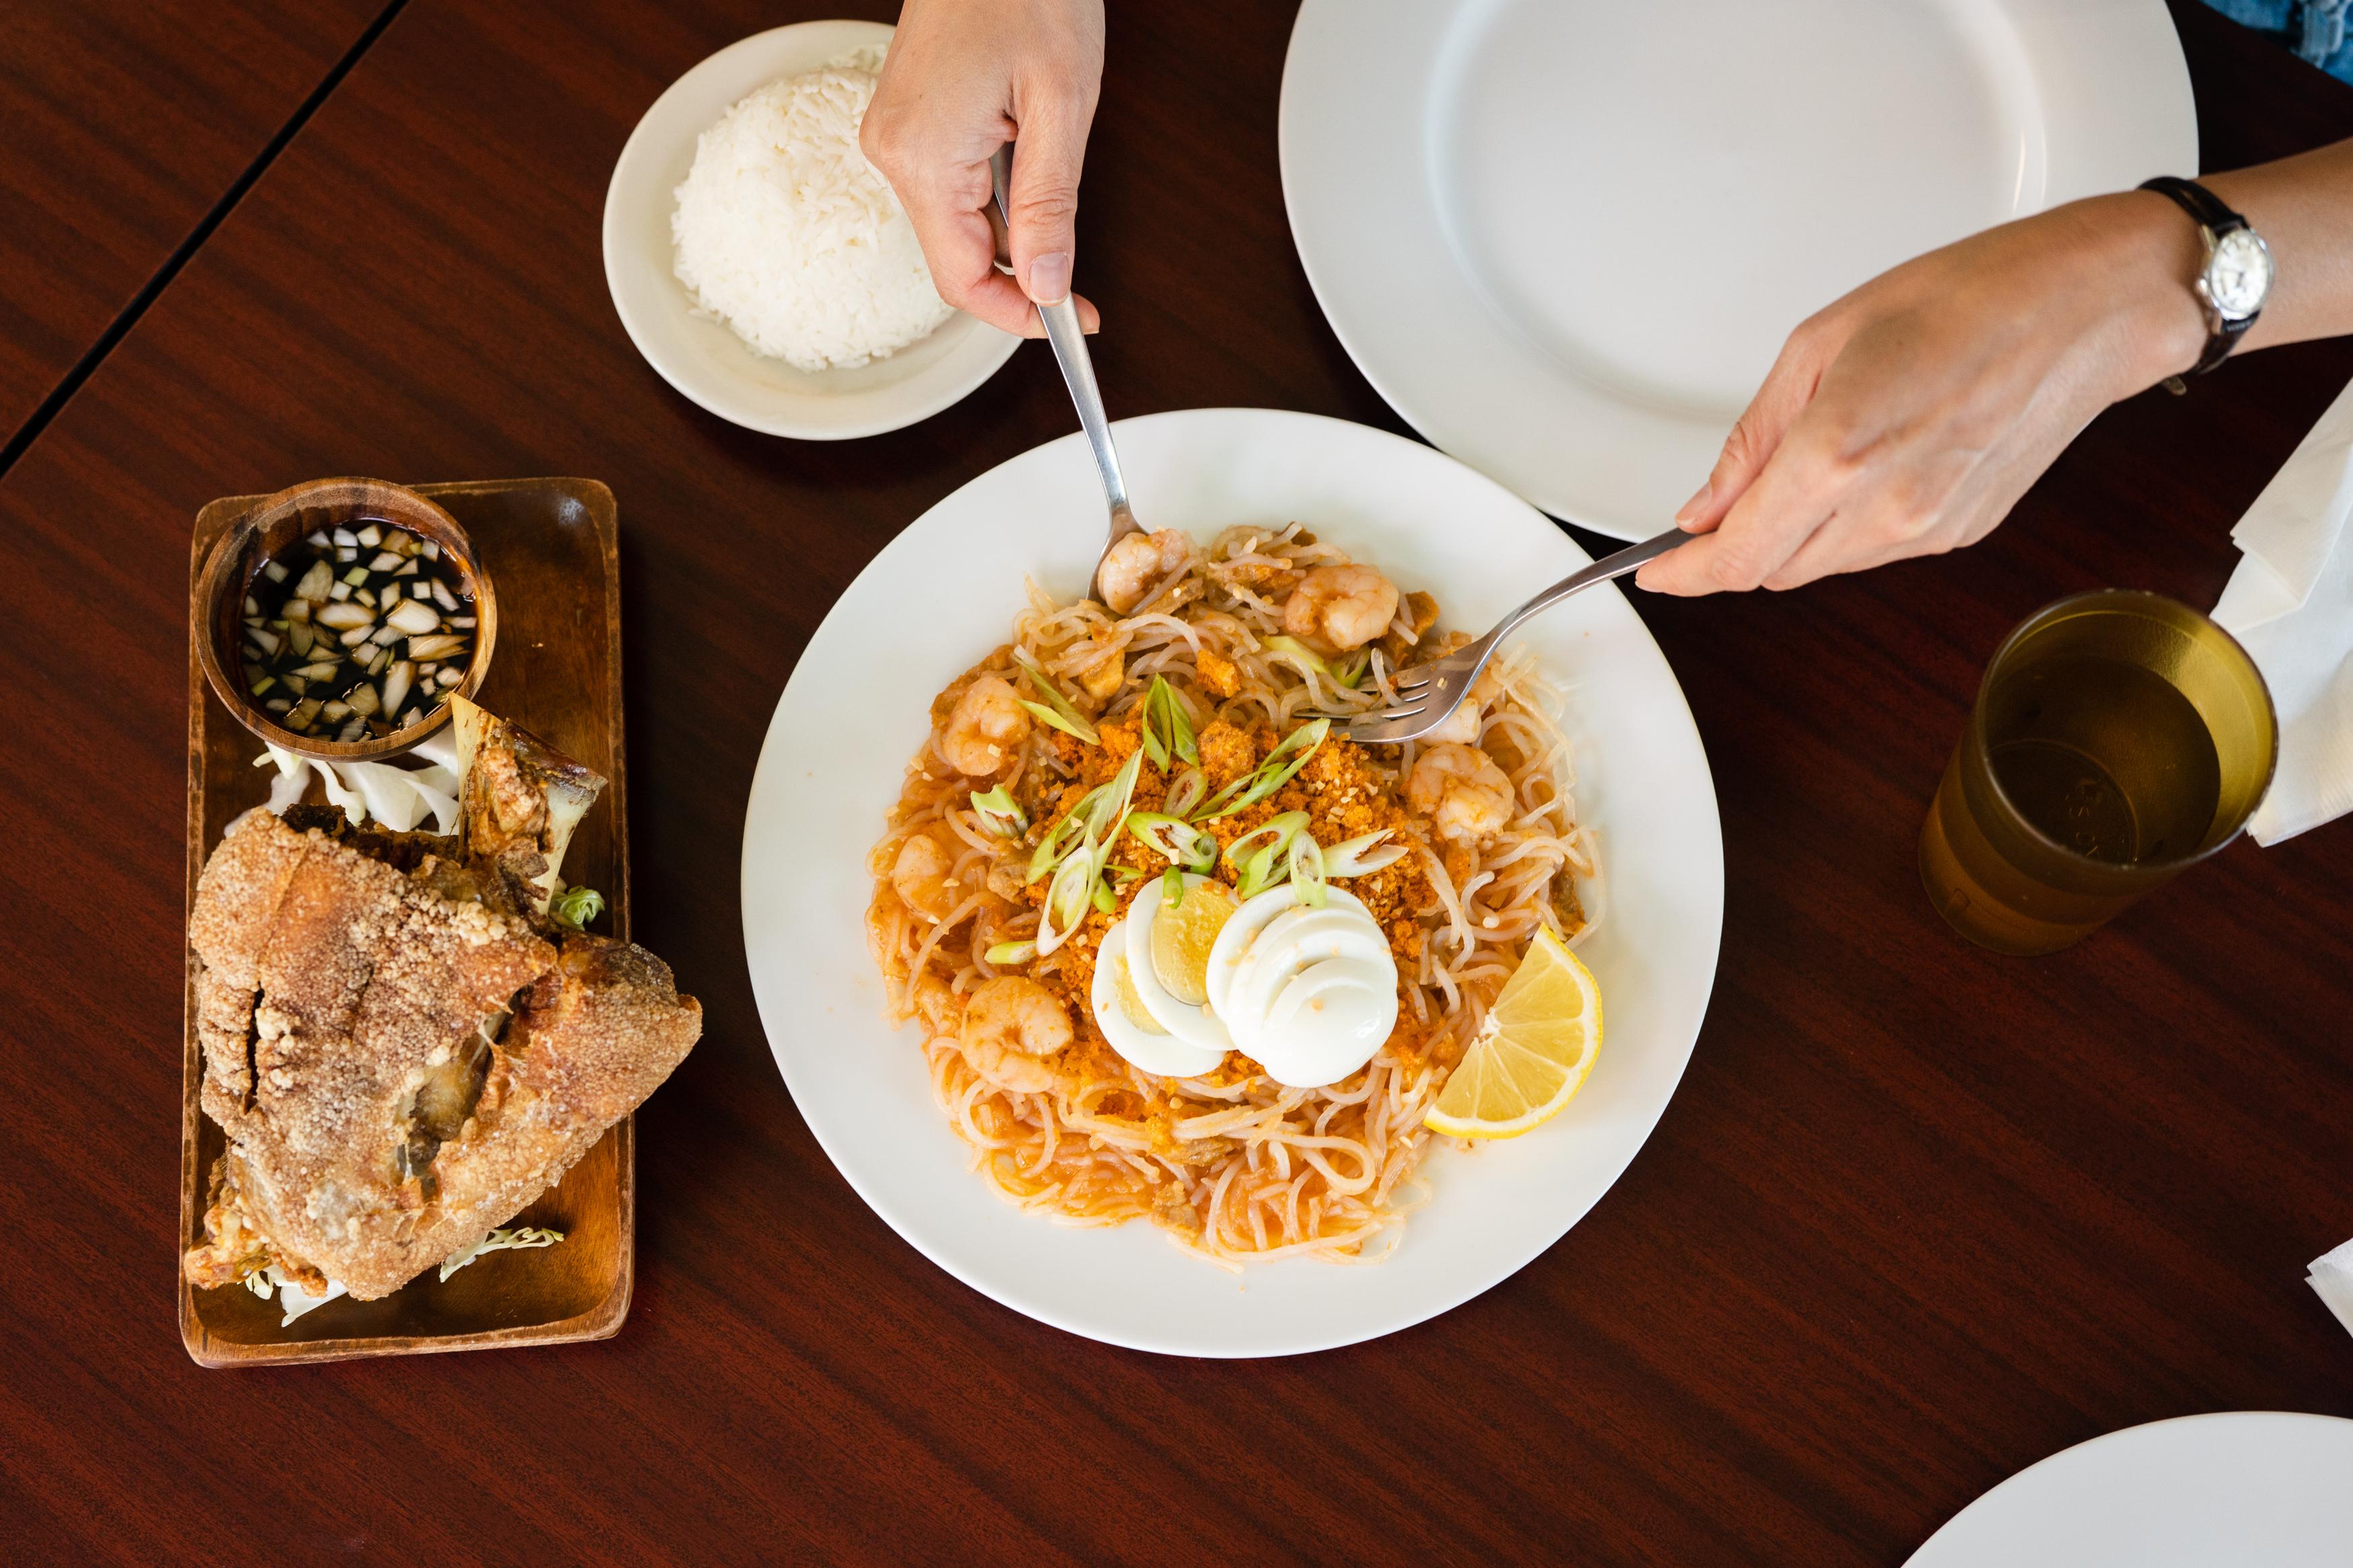 Two hands serve up a shrimp noodle dish, next to a crispy piece of pork